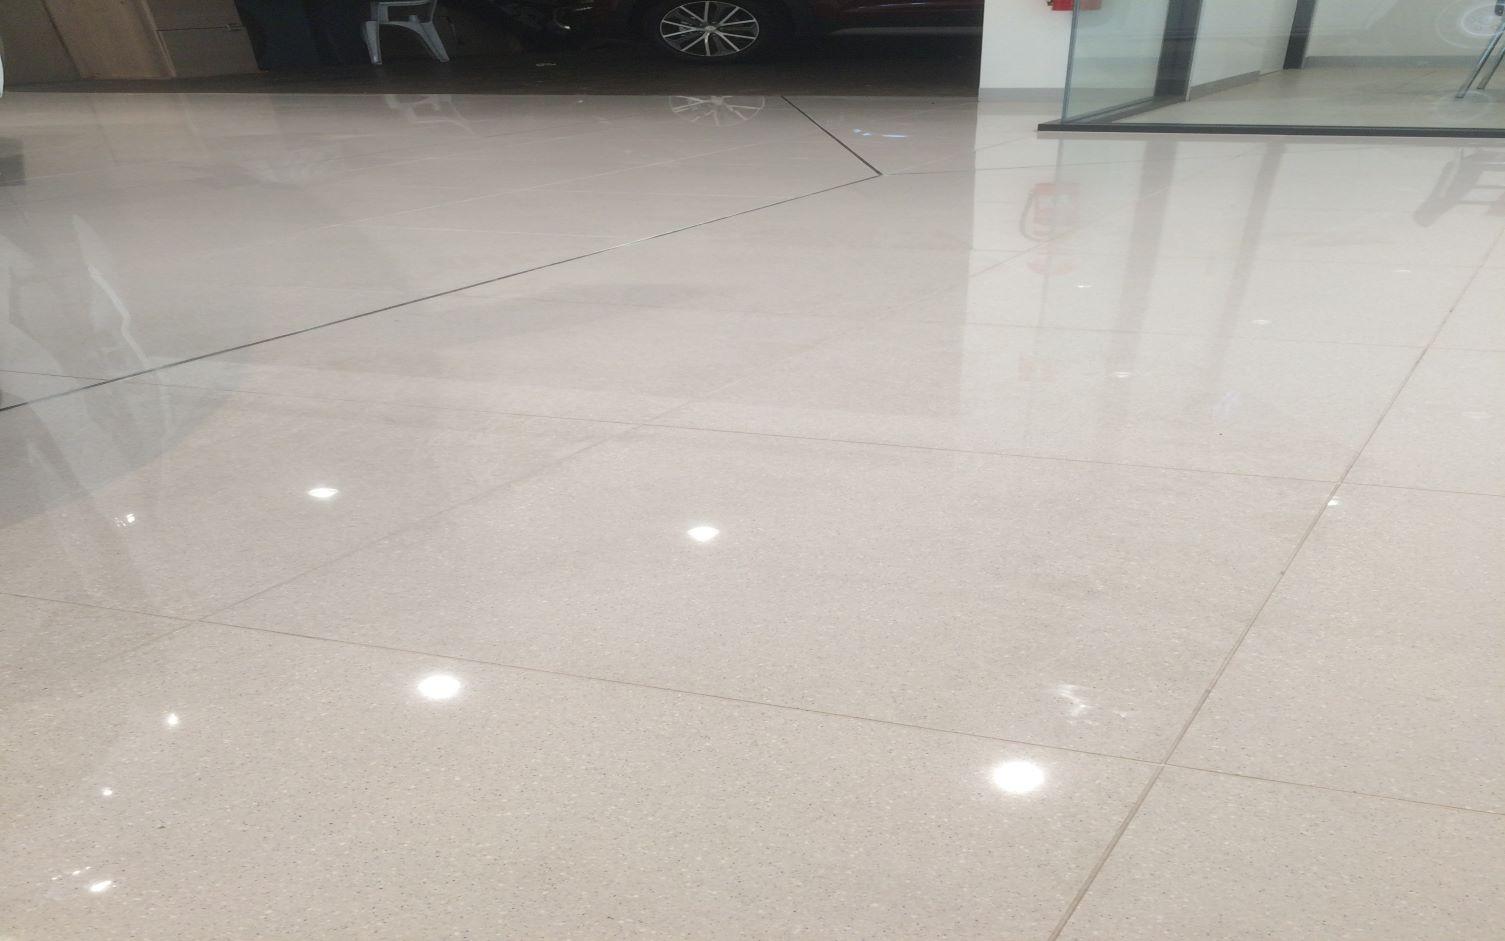 https://ggtiling.com.au/wp-content/uploads/2019/08/G-G-Tiling-Commercial-Maugham-Thiem-Hyundai_1.jpg